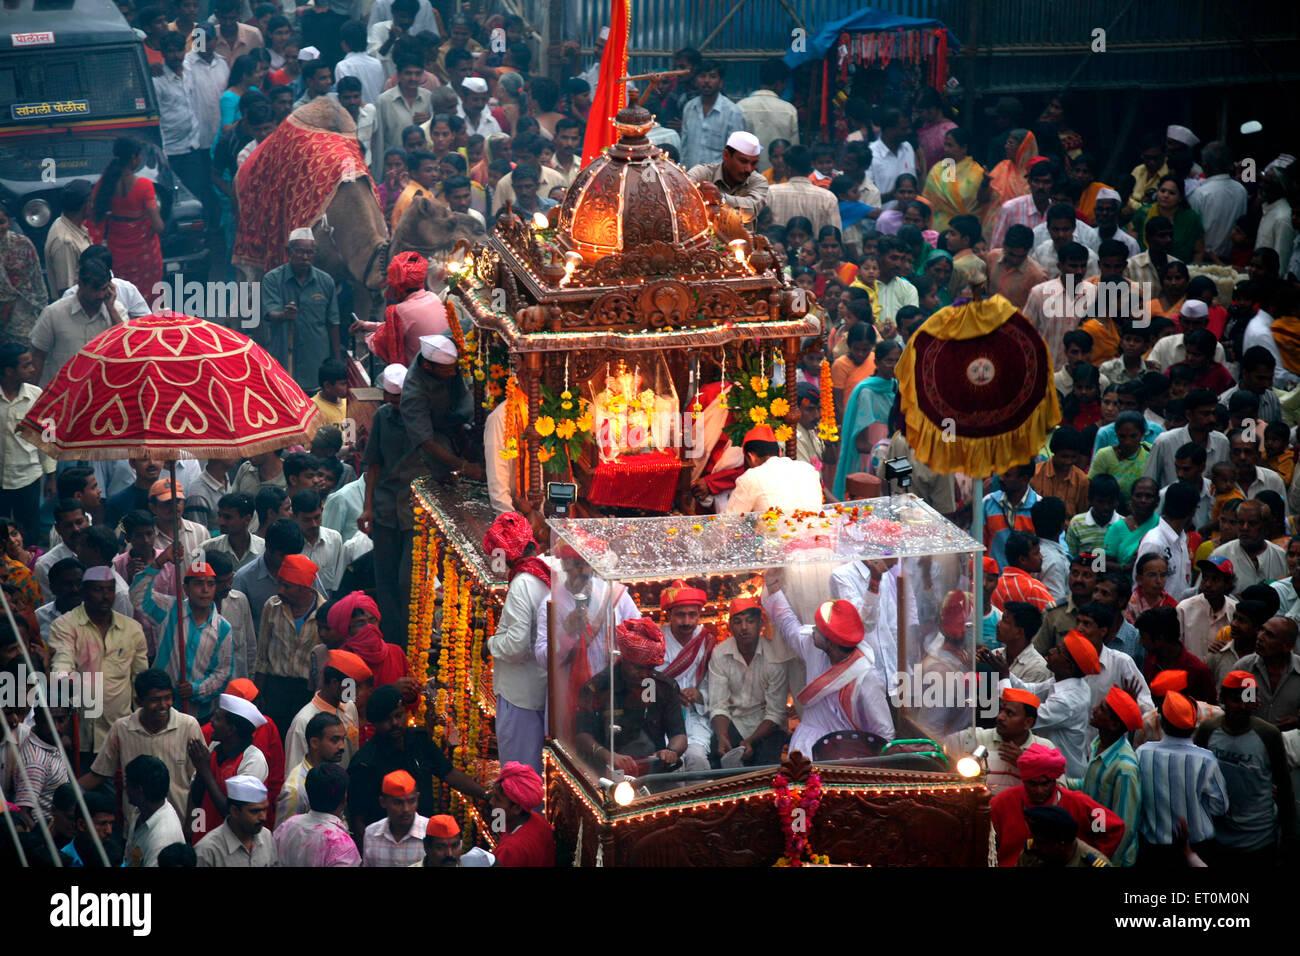 Royal processions of immersion of lord Ganesh organized by Shrimant Raja Saheb Vijaysingh Rao Patwardhan ; Sangli - Stock Image